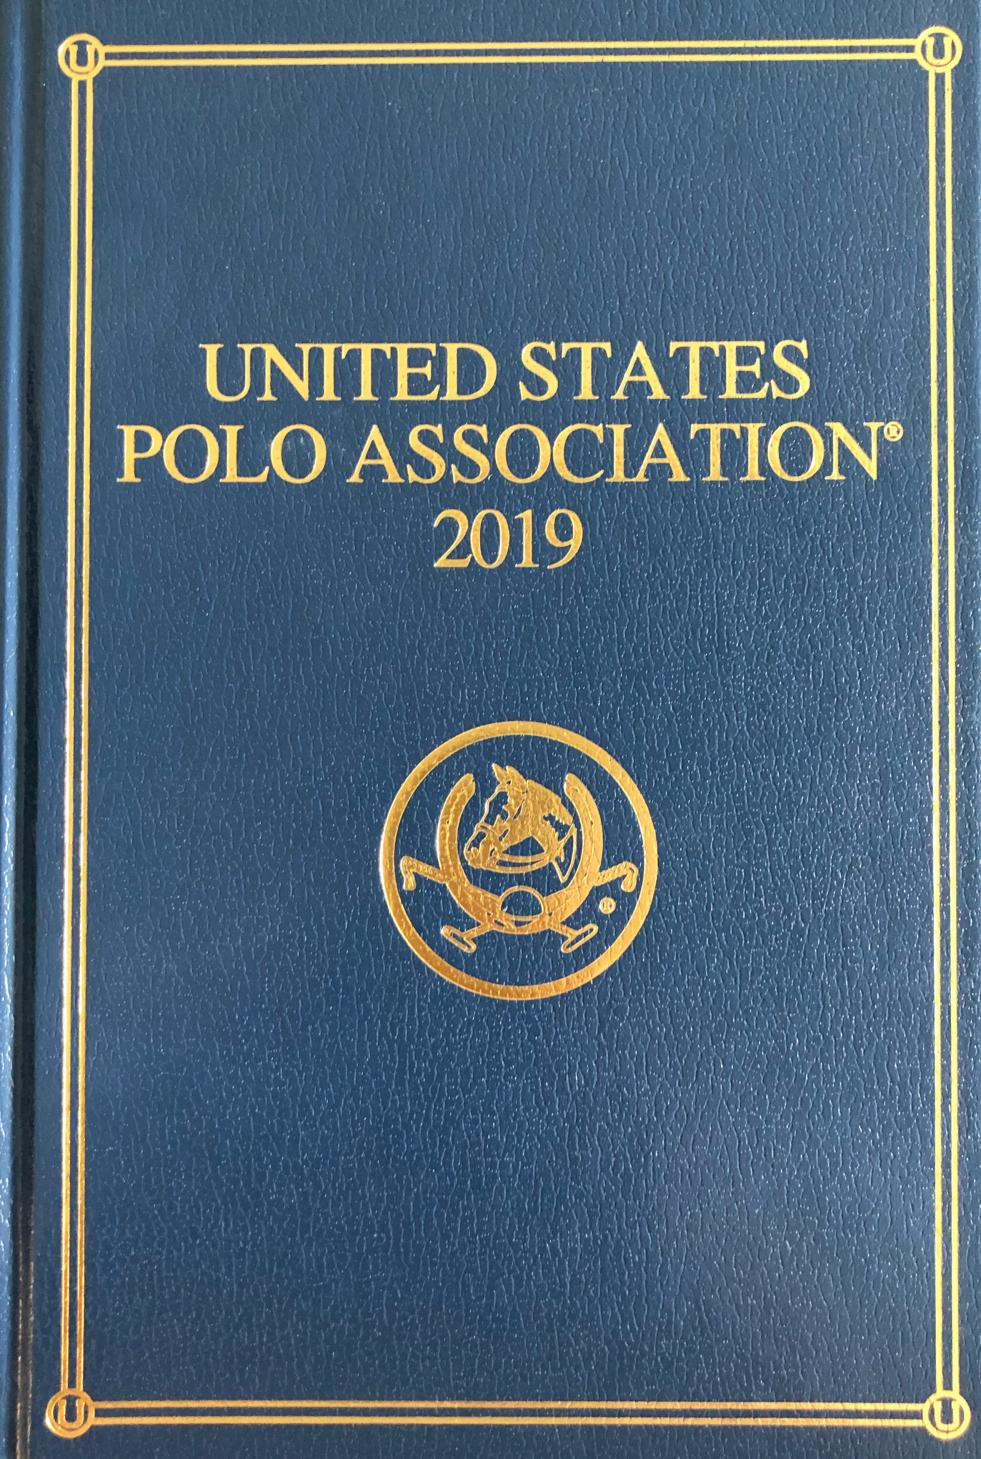 2019 USPA Bluebook by United States Polo Association - issuu